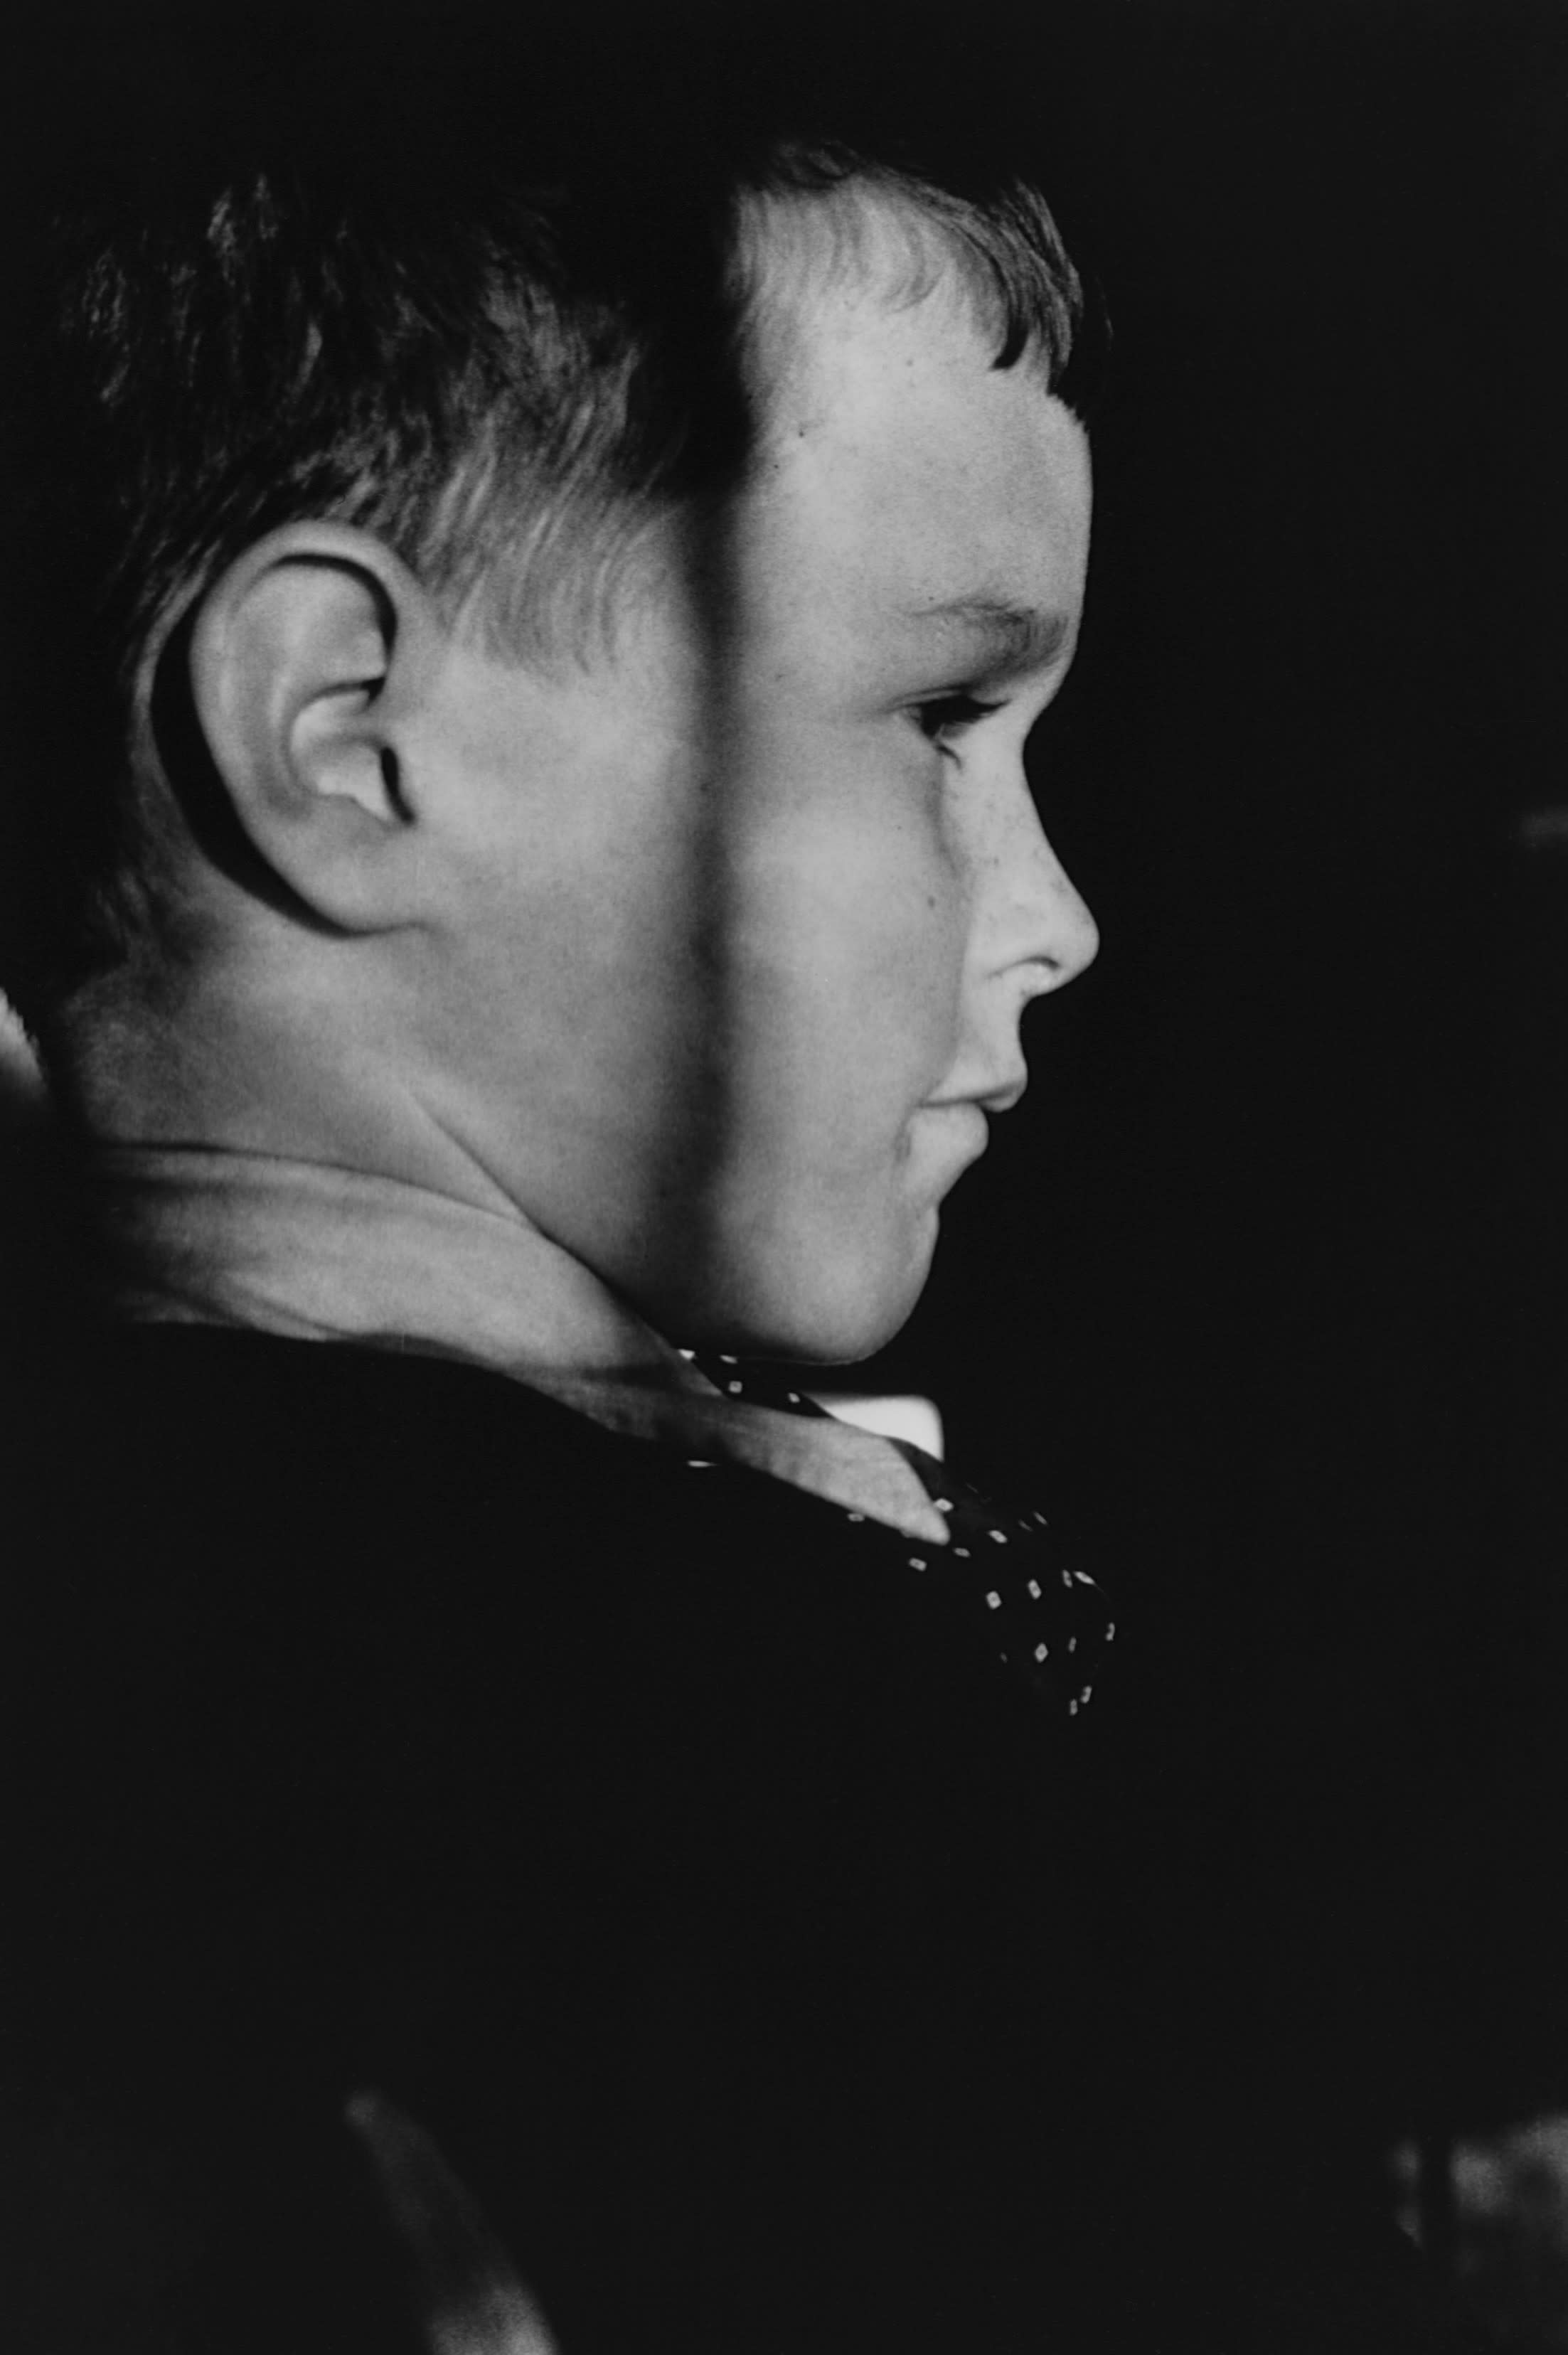 <p>George Bush as a young boy. (Photo: Corbis) </p>